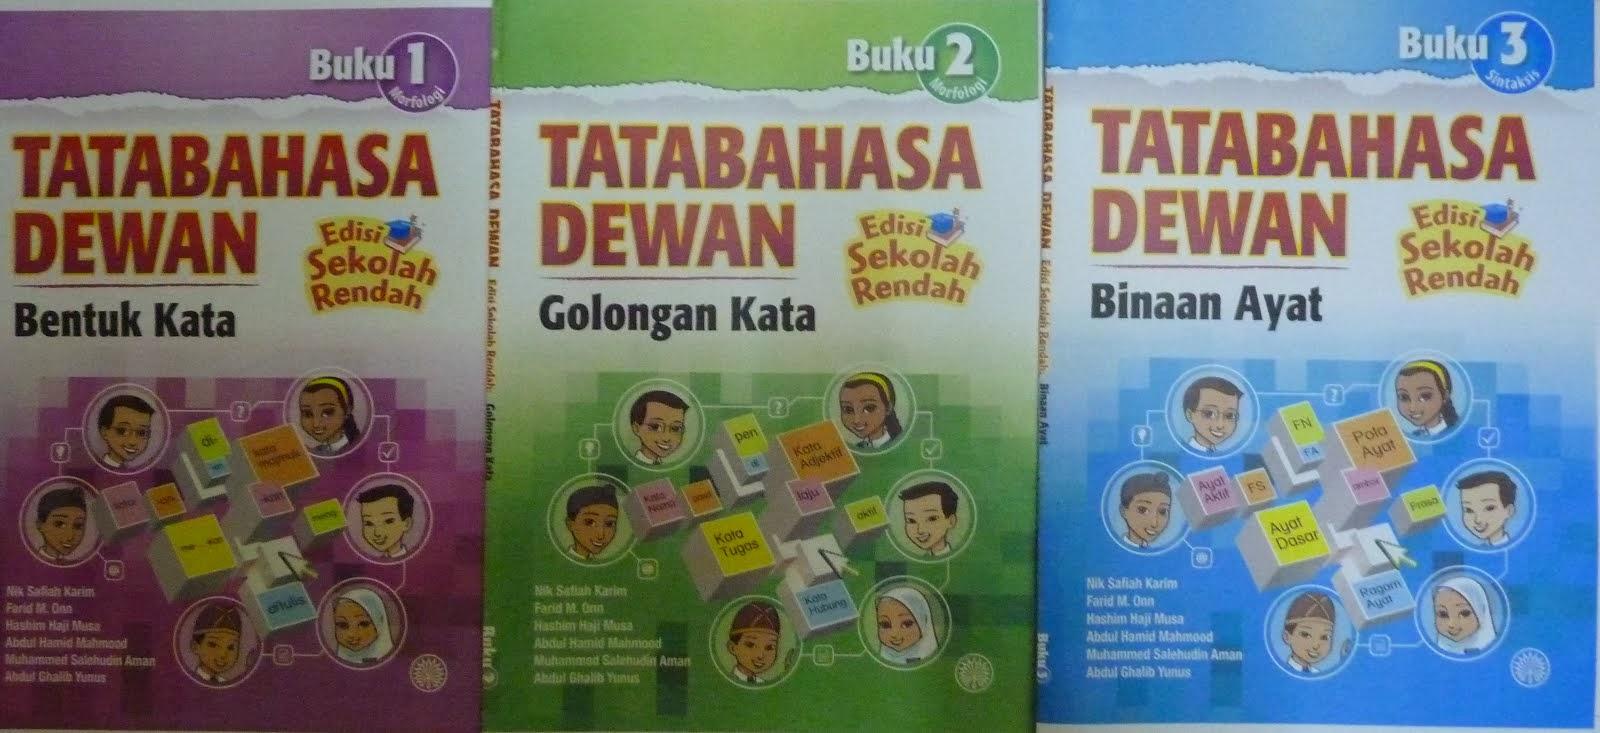 Buku Tatabahasa Dewan Edisi Sekolah Rendah (Buku 1, 2 dan 3)